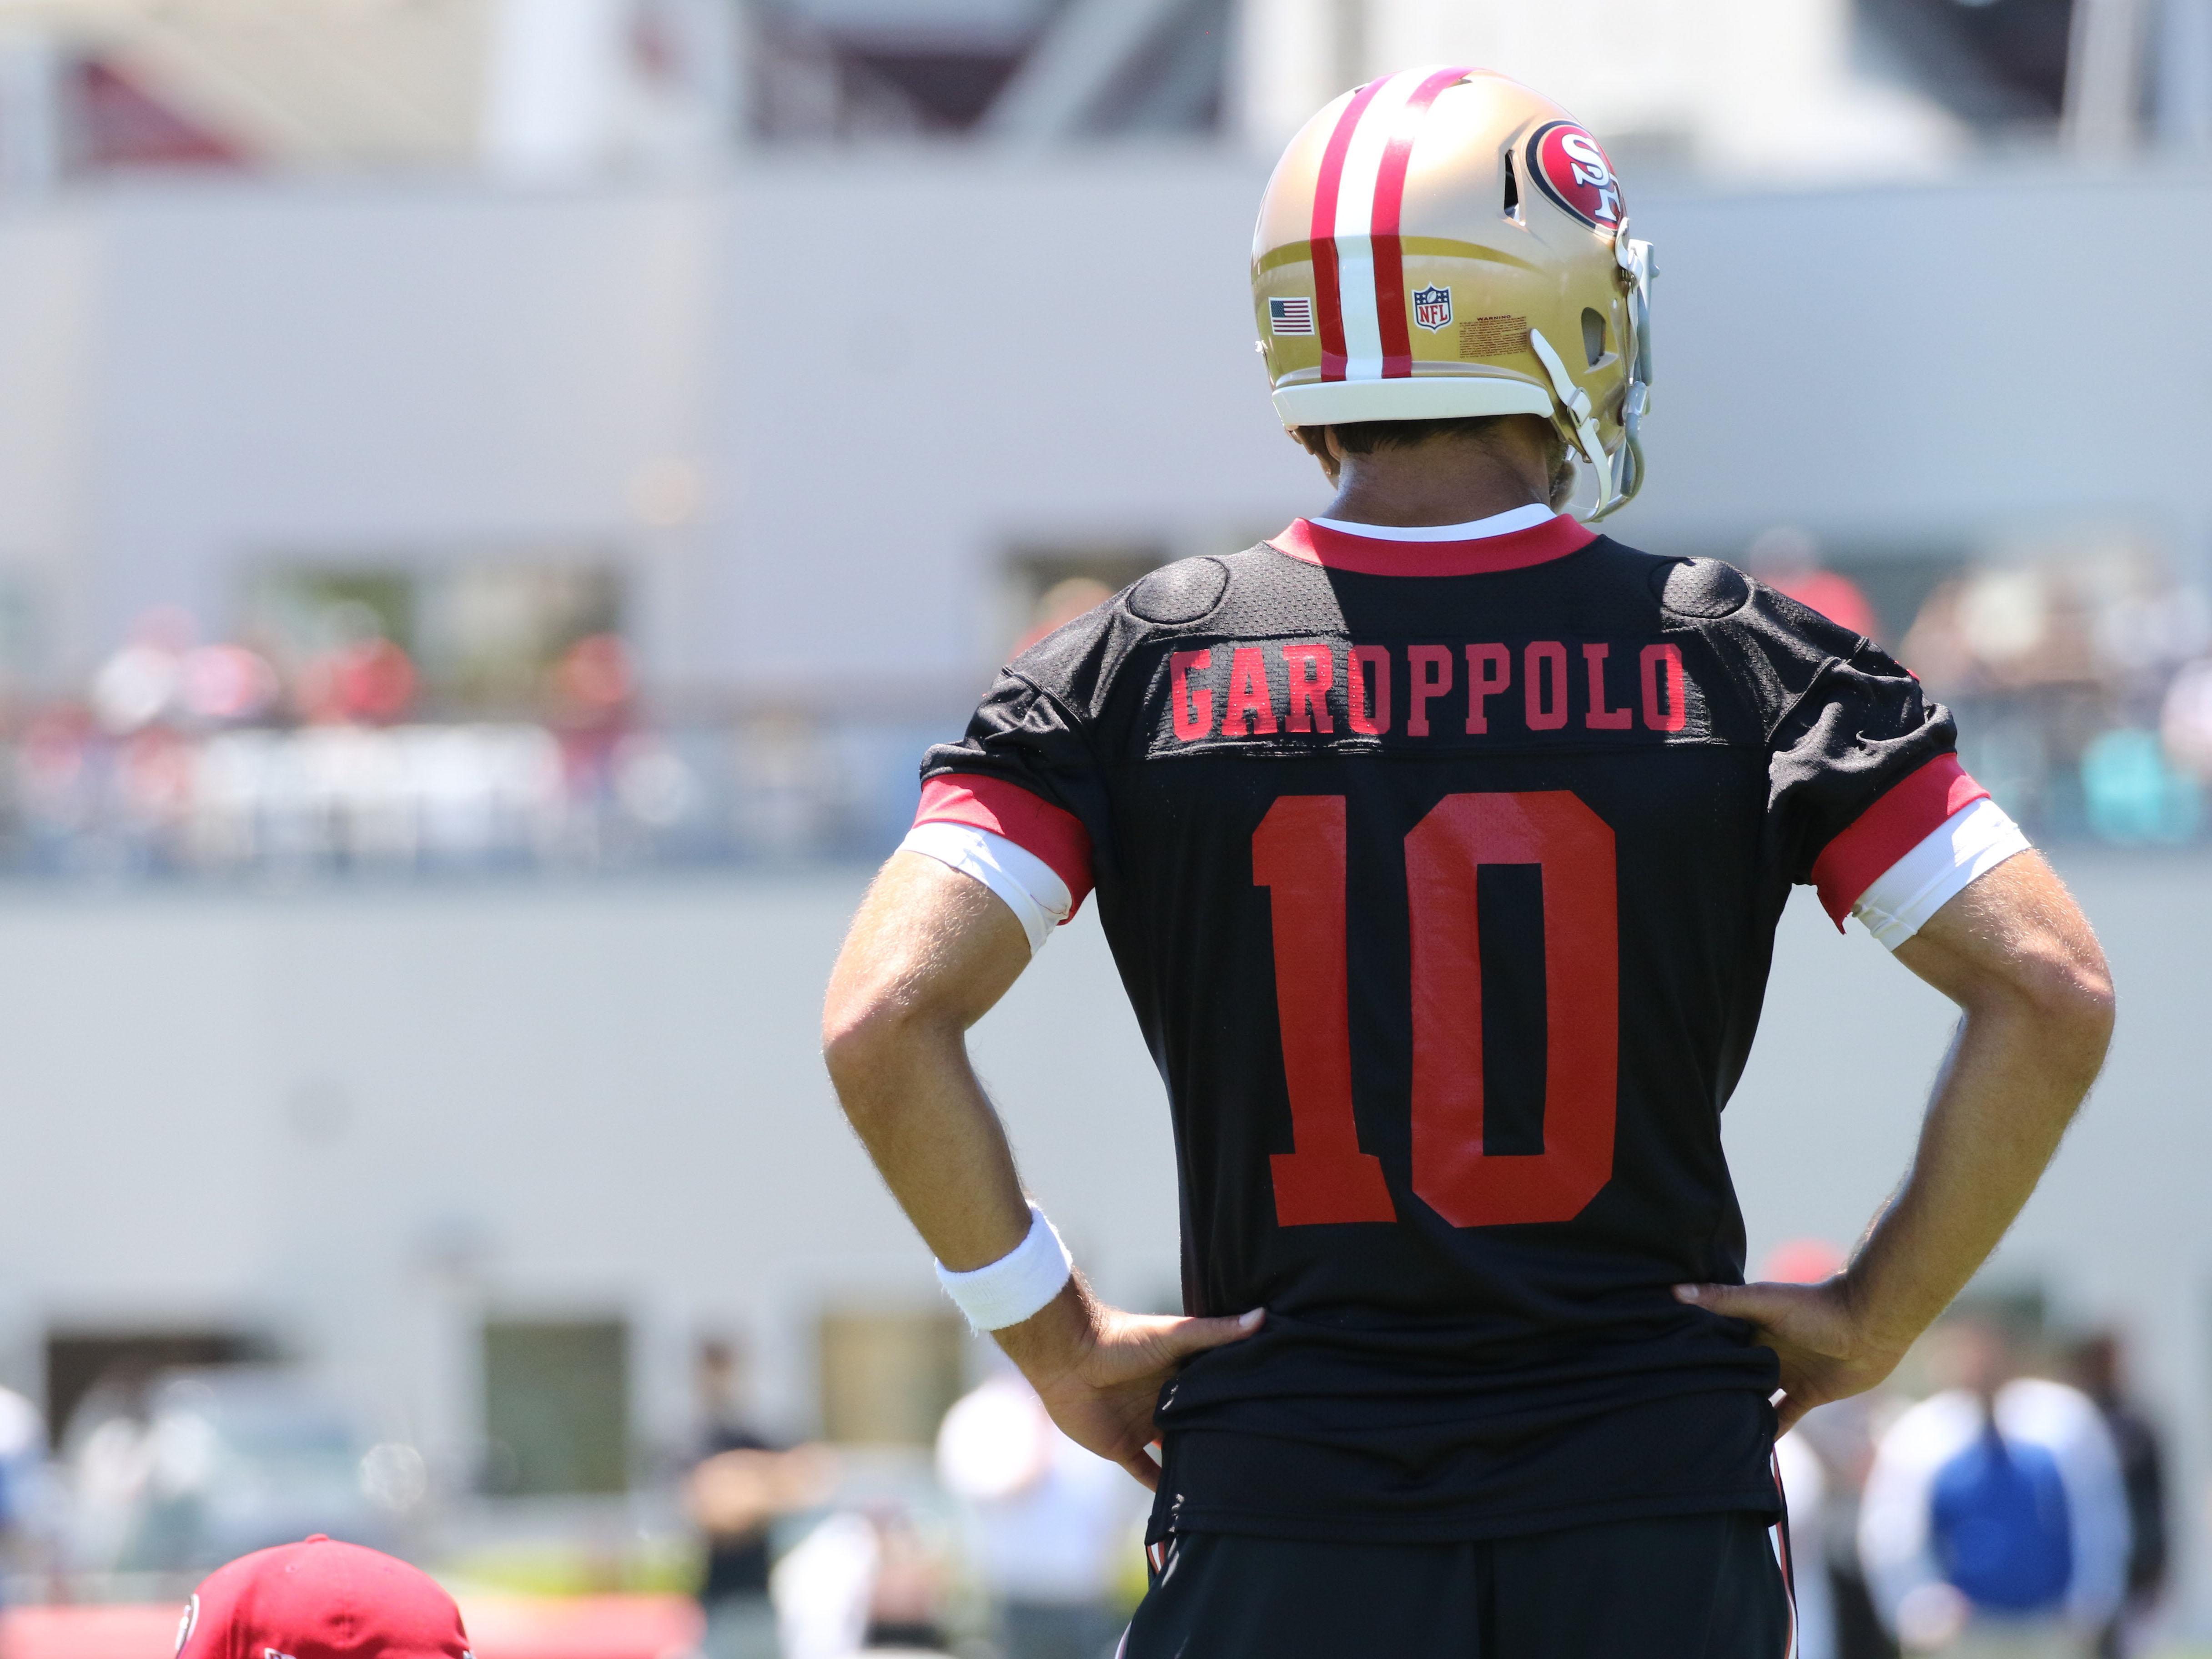 NFL: JUN 12 49ers Minicamp